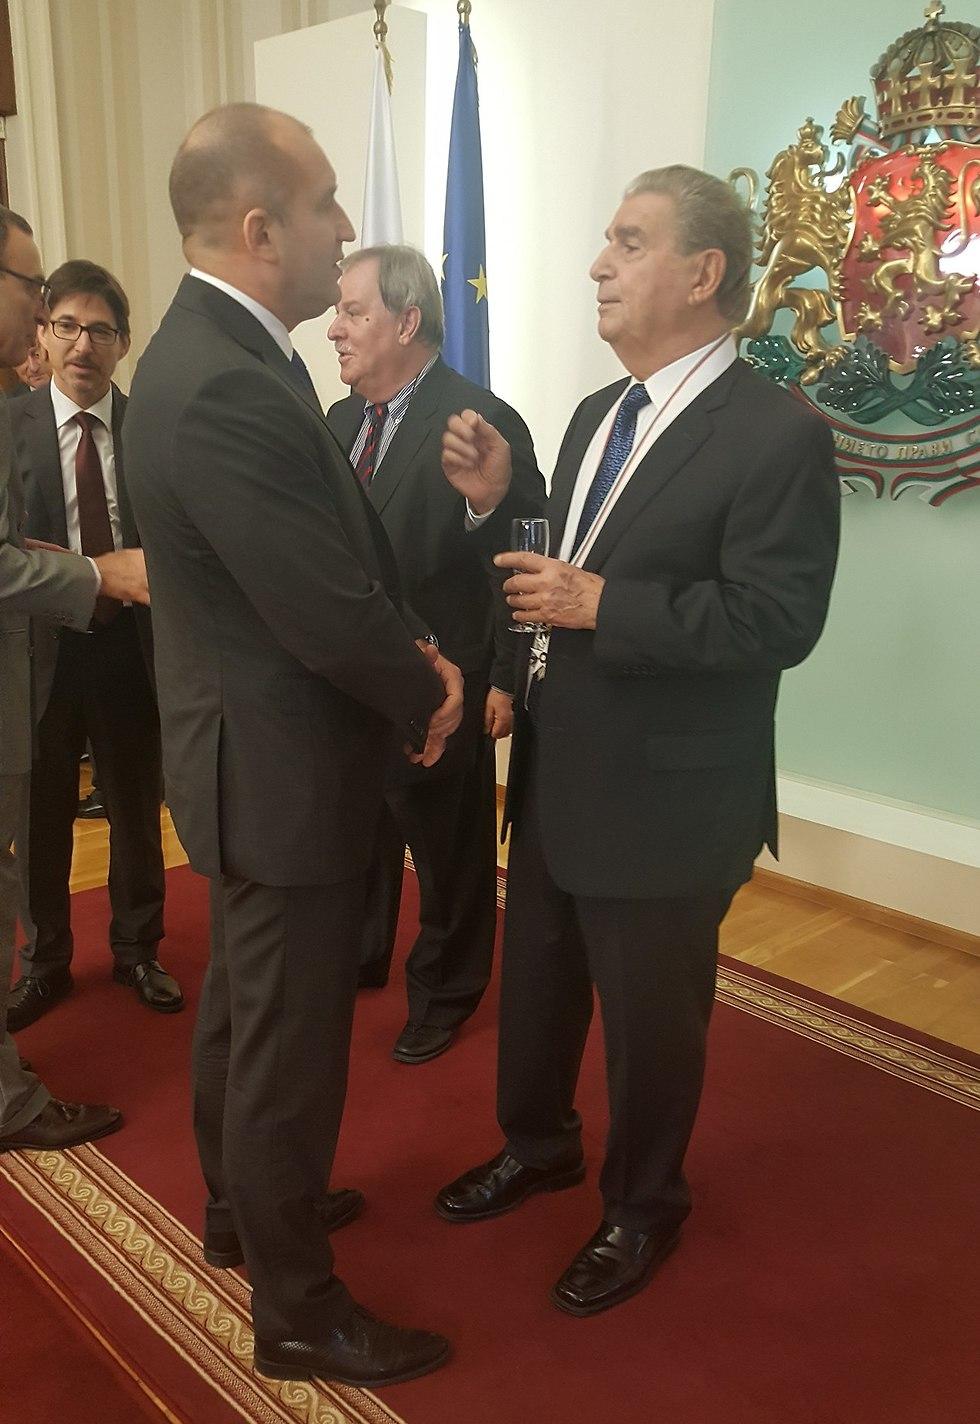 Prof. Bar-Zohar and the President of Bulgaria (Photo: Miki Bar-Zohar)